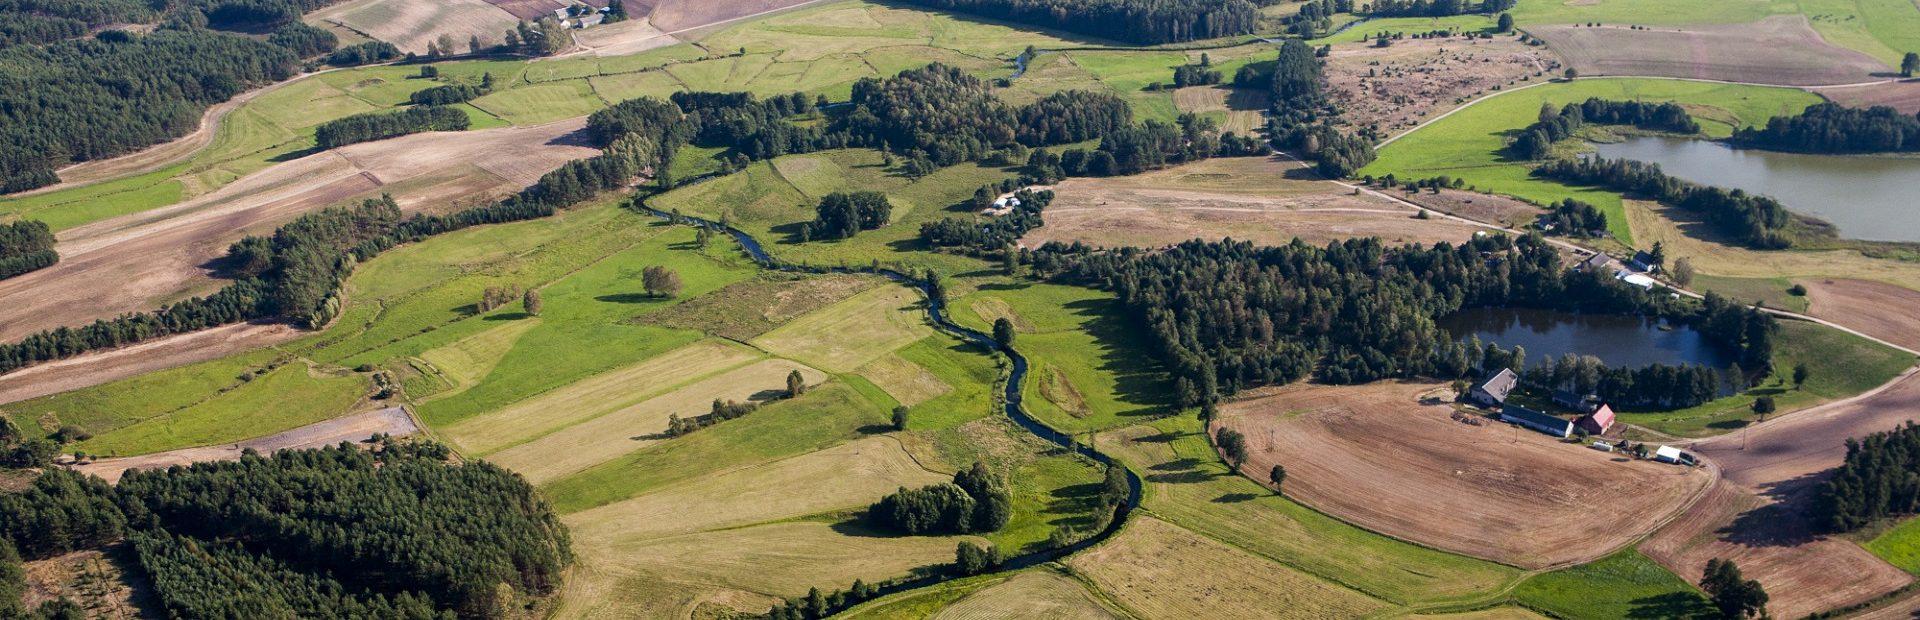 The Wdzydze Landscape Park